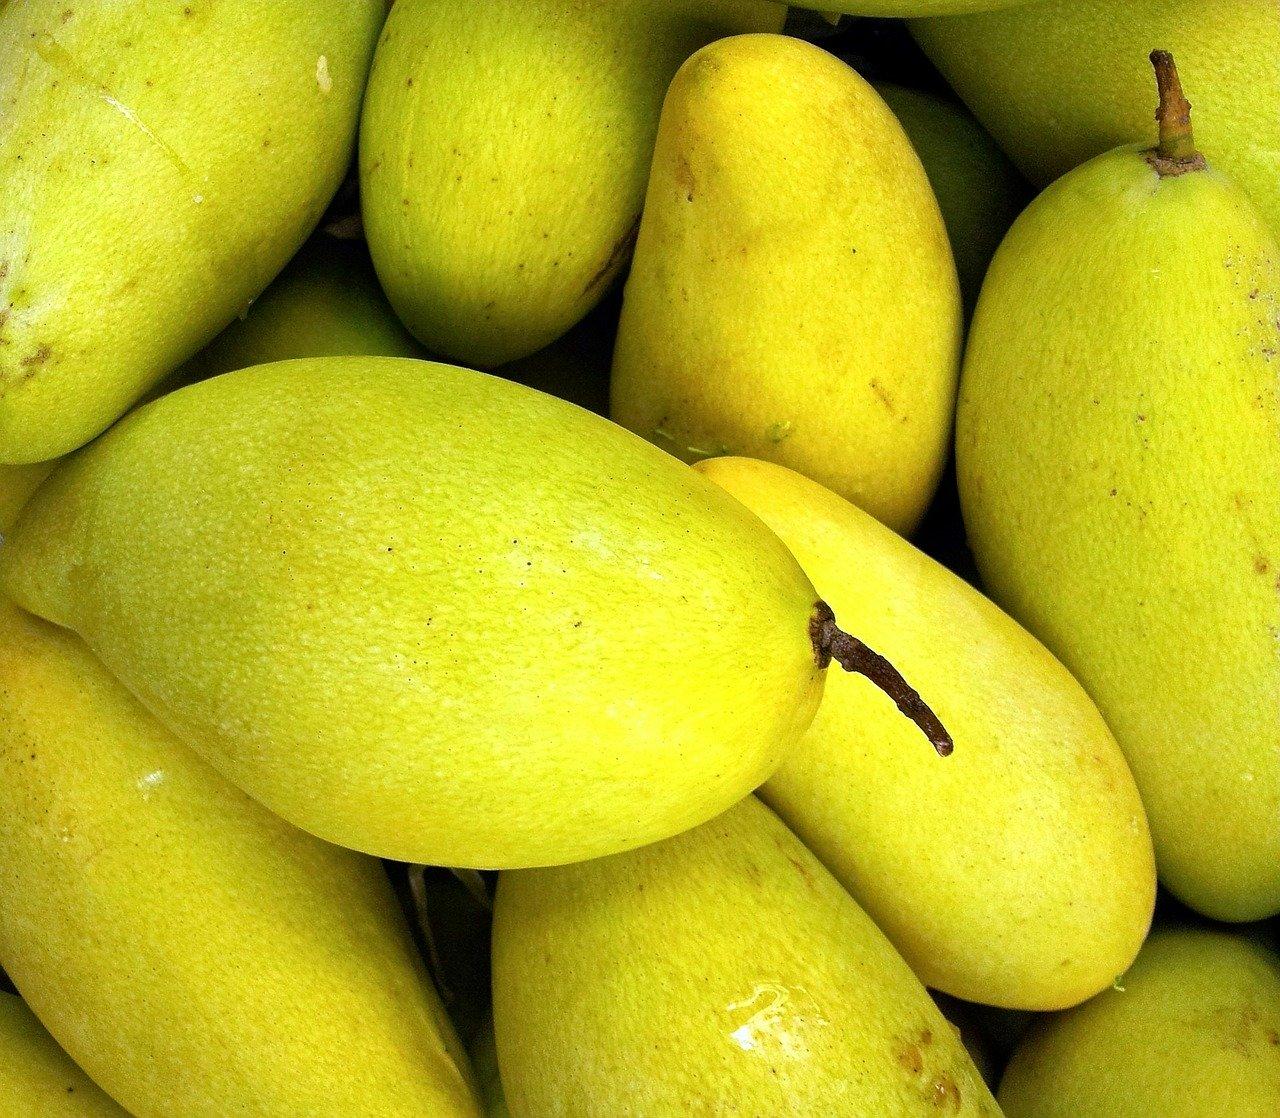 Yellowish fresh mango fruit